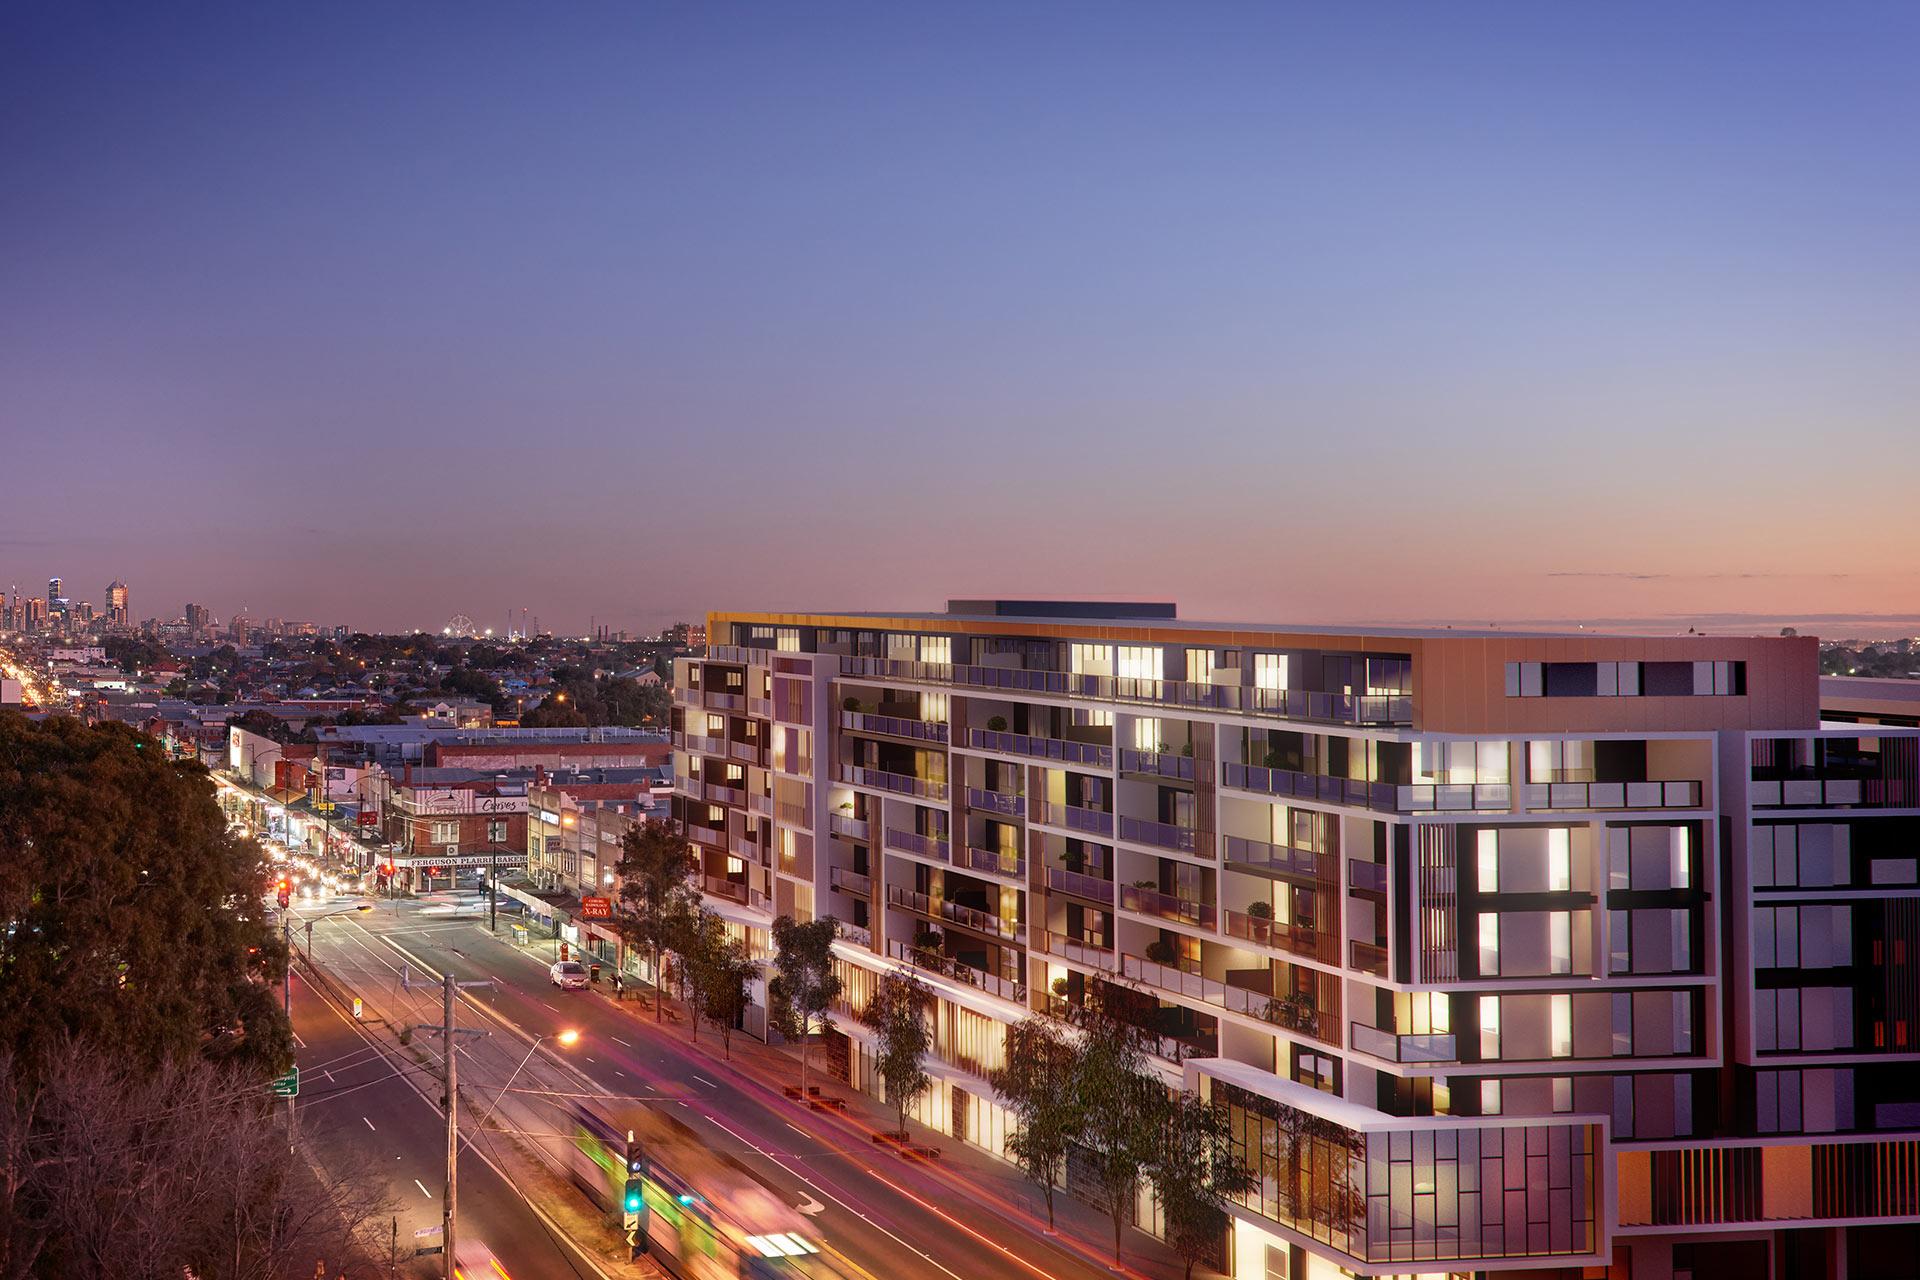 https://jamarchitects.com.au/wp-content/uploads/2021/08/JAM-Projects-SydneyRd02-1920x1280-1.jpg